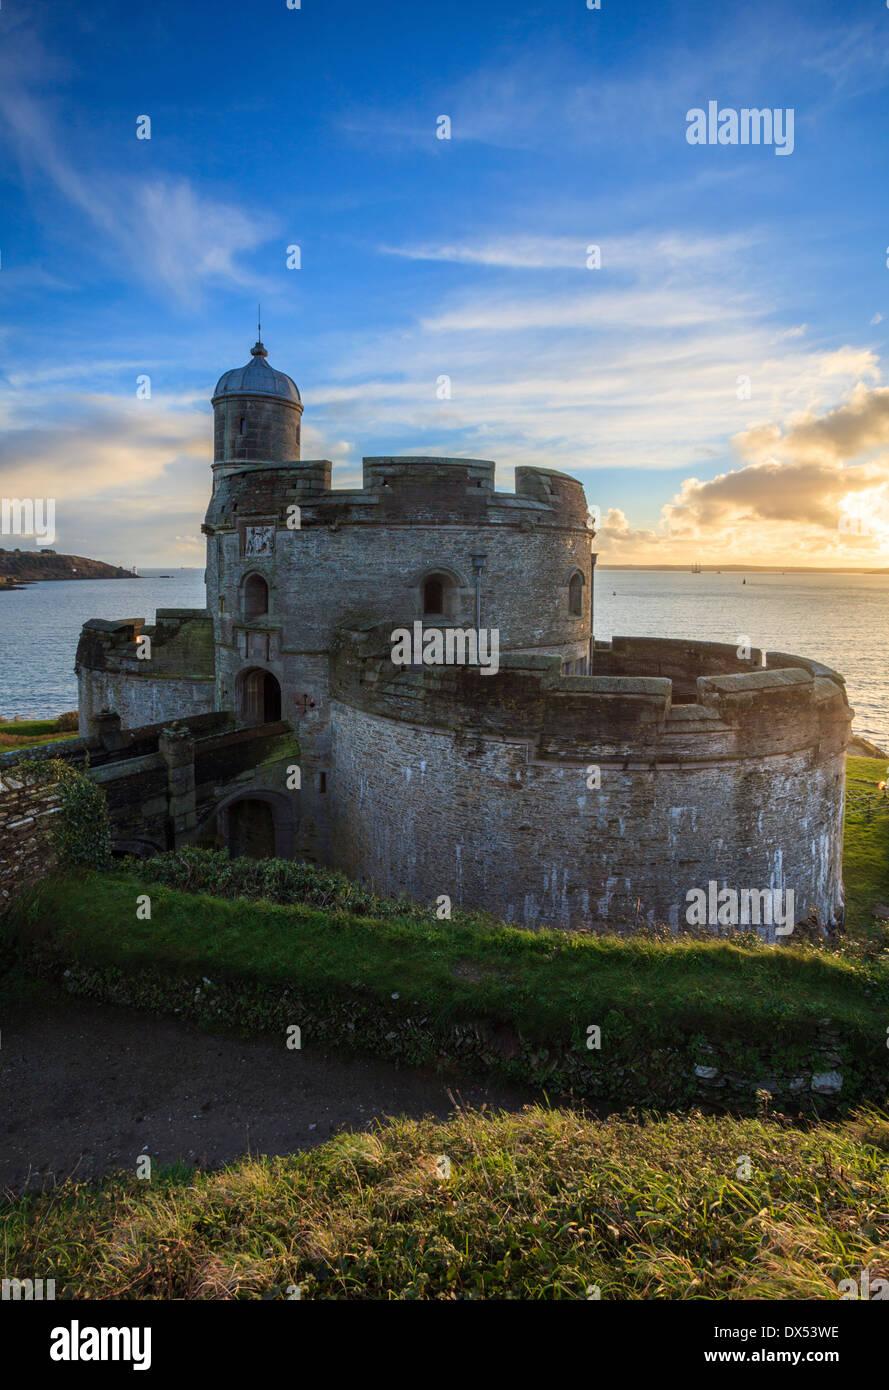 St. Mawes Castle gefangen bei Sonnenuntergang Stockbild